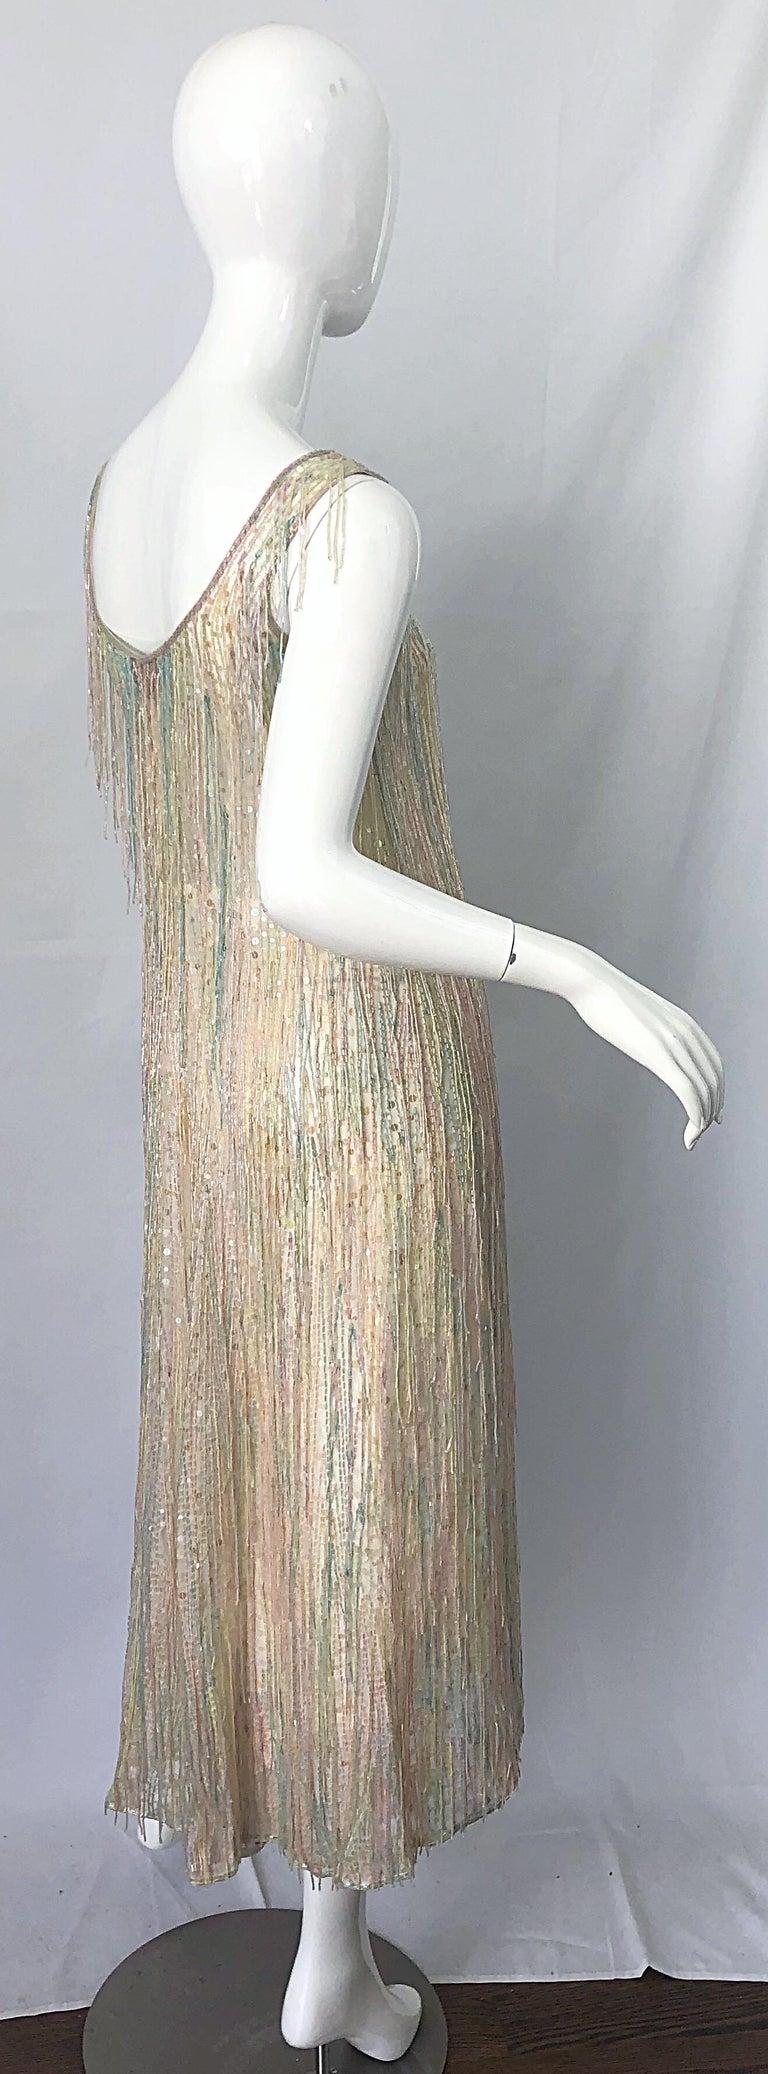 Halston MET Musuem 1970s Fully Fringed Beaded Flapper Style Vintage 70s Dress For Sale 9